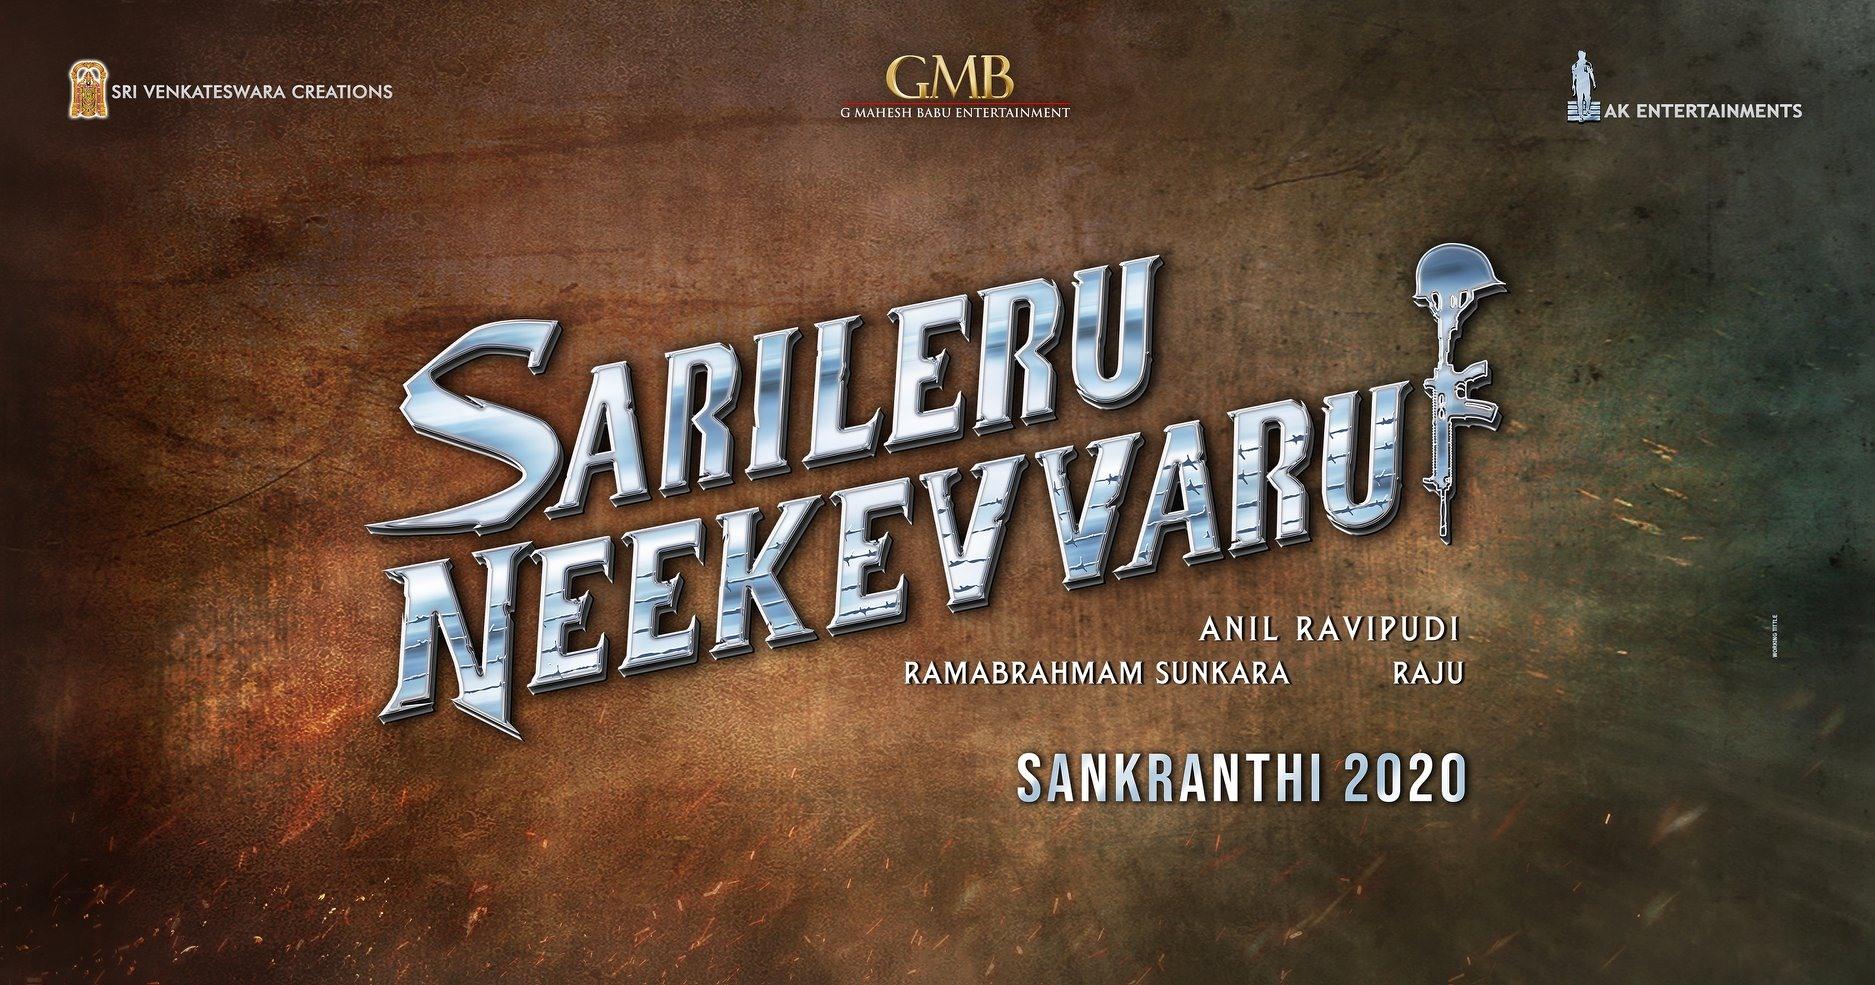 Srimanthudu Ultra Hd All Posters Wallpapers: Mahesh Babu Sarileru Neekevvaru Movie First Look ULTRA HD